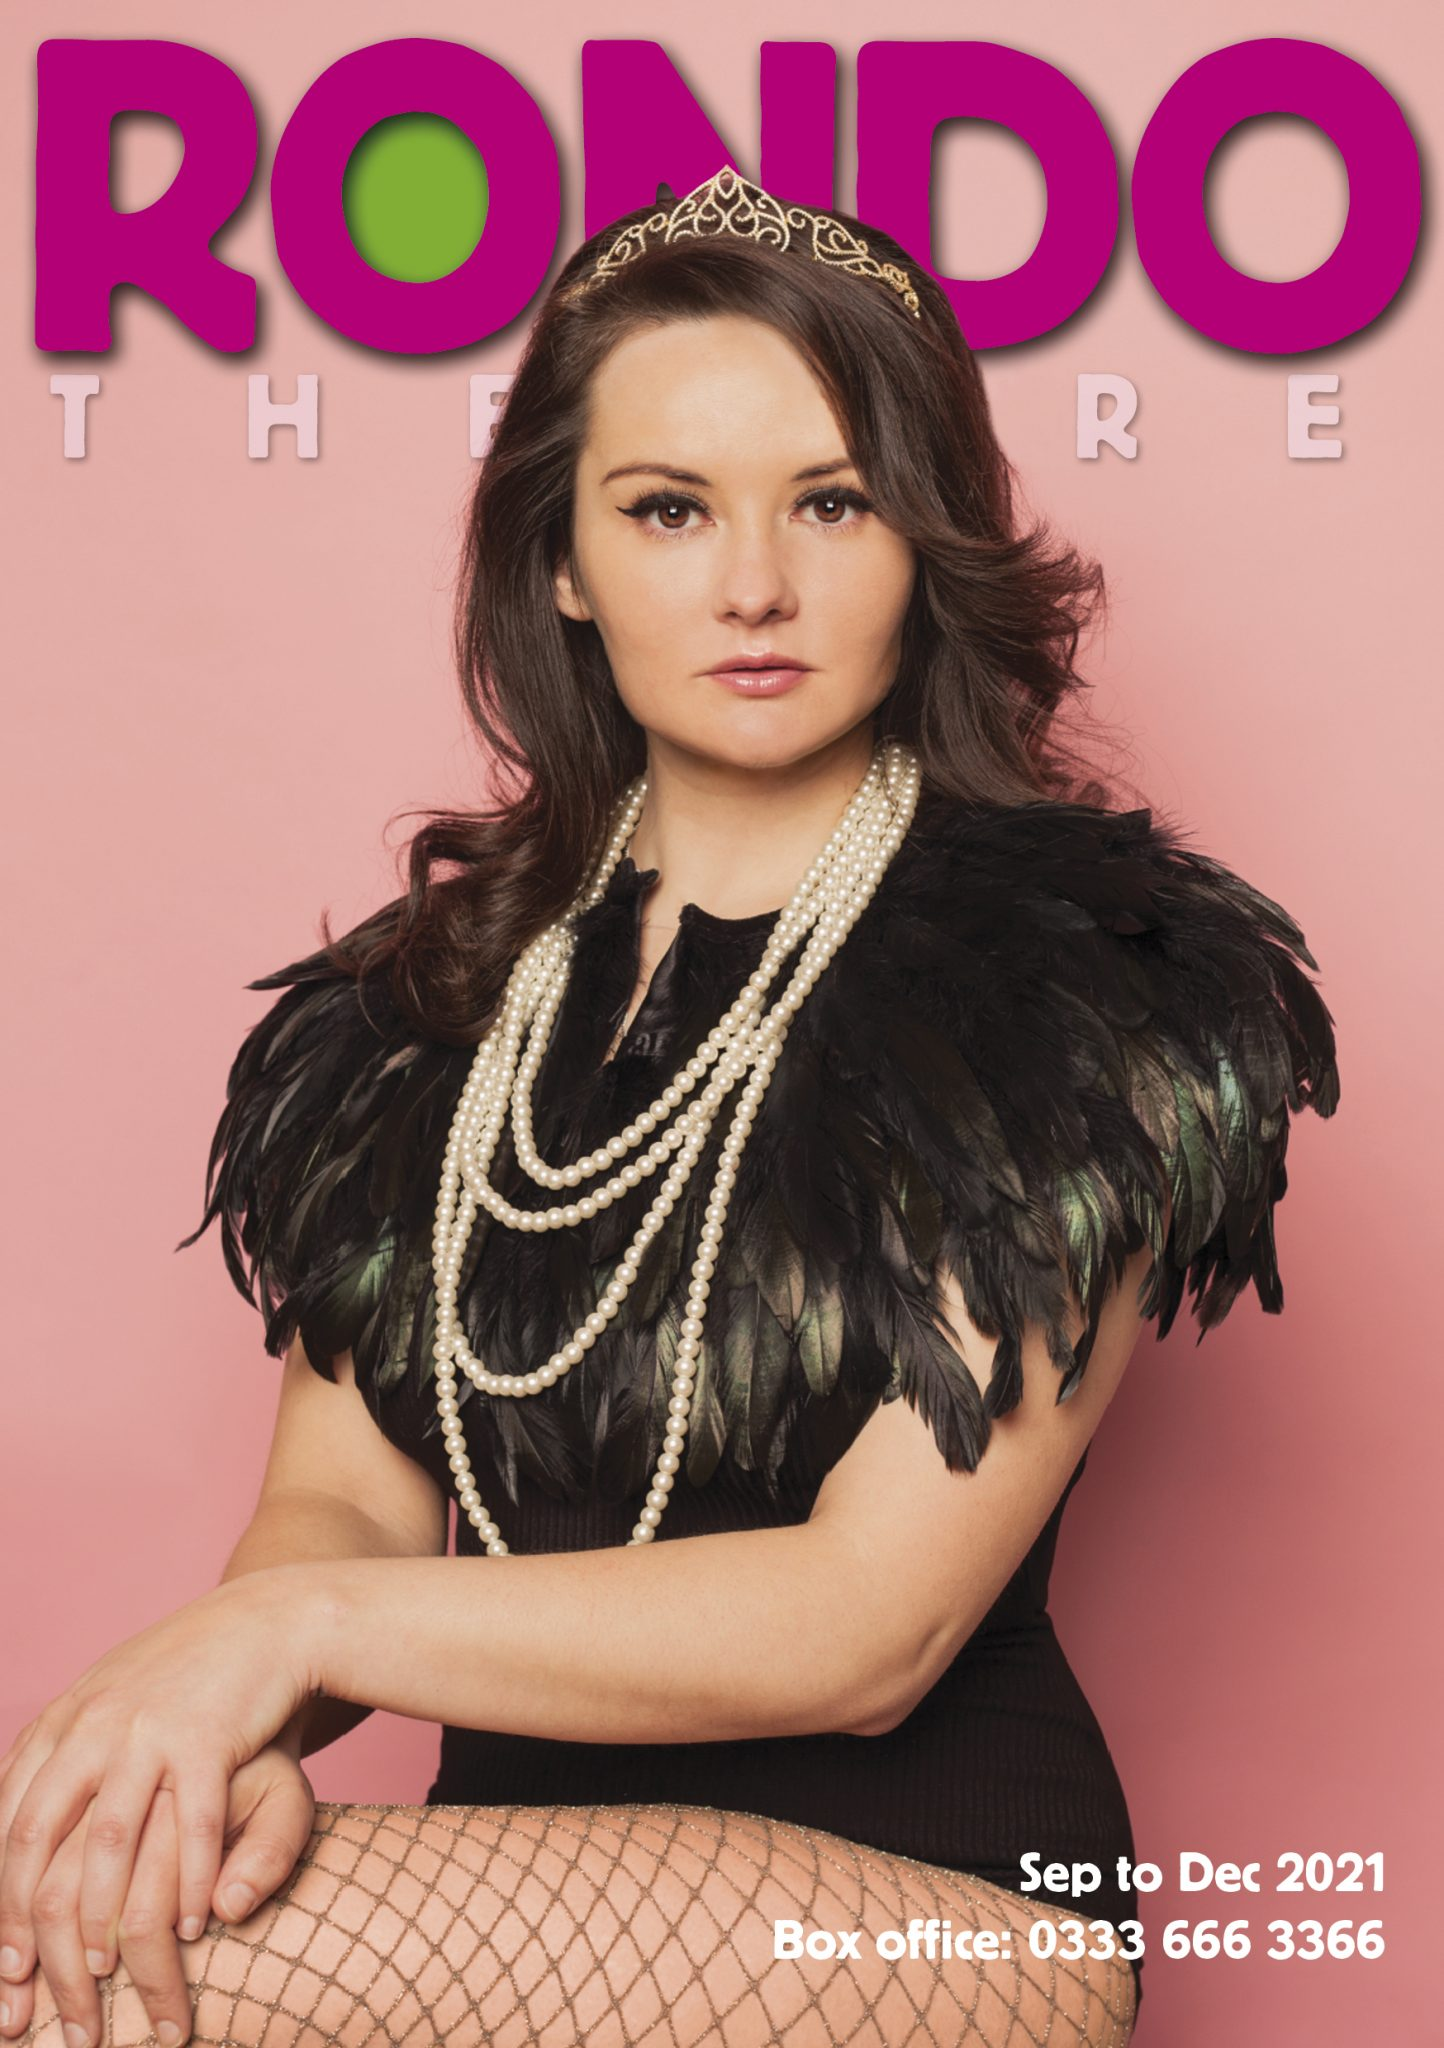 Rondo Theatre Autumn 2021 Programme cover